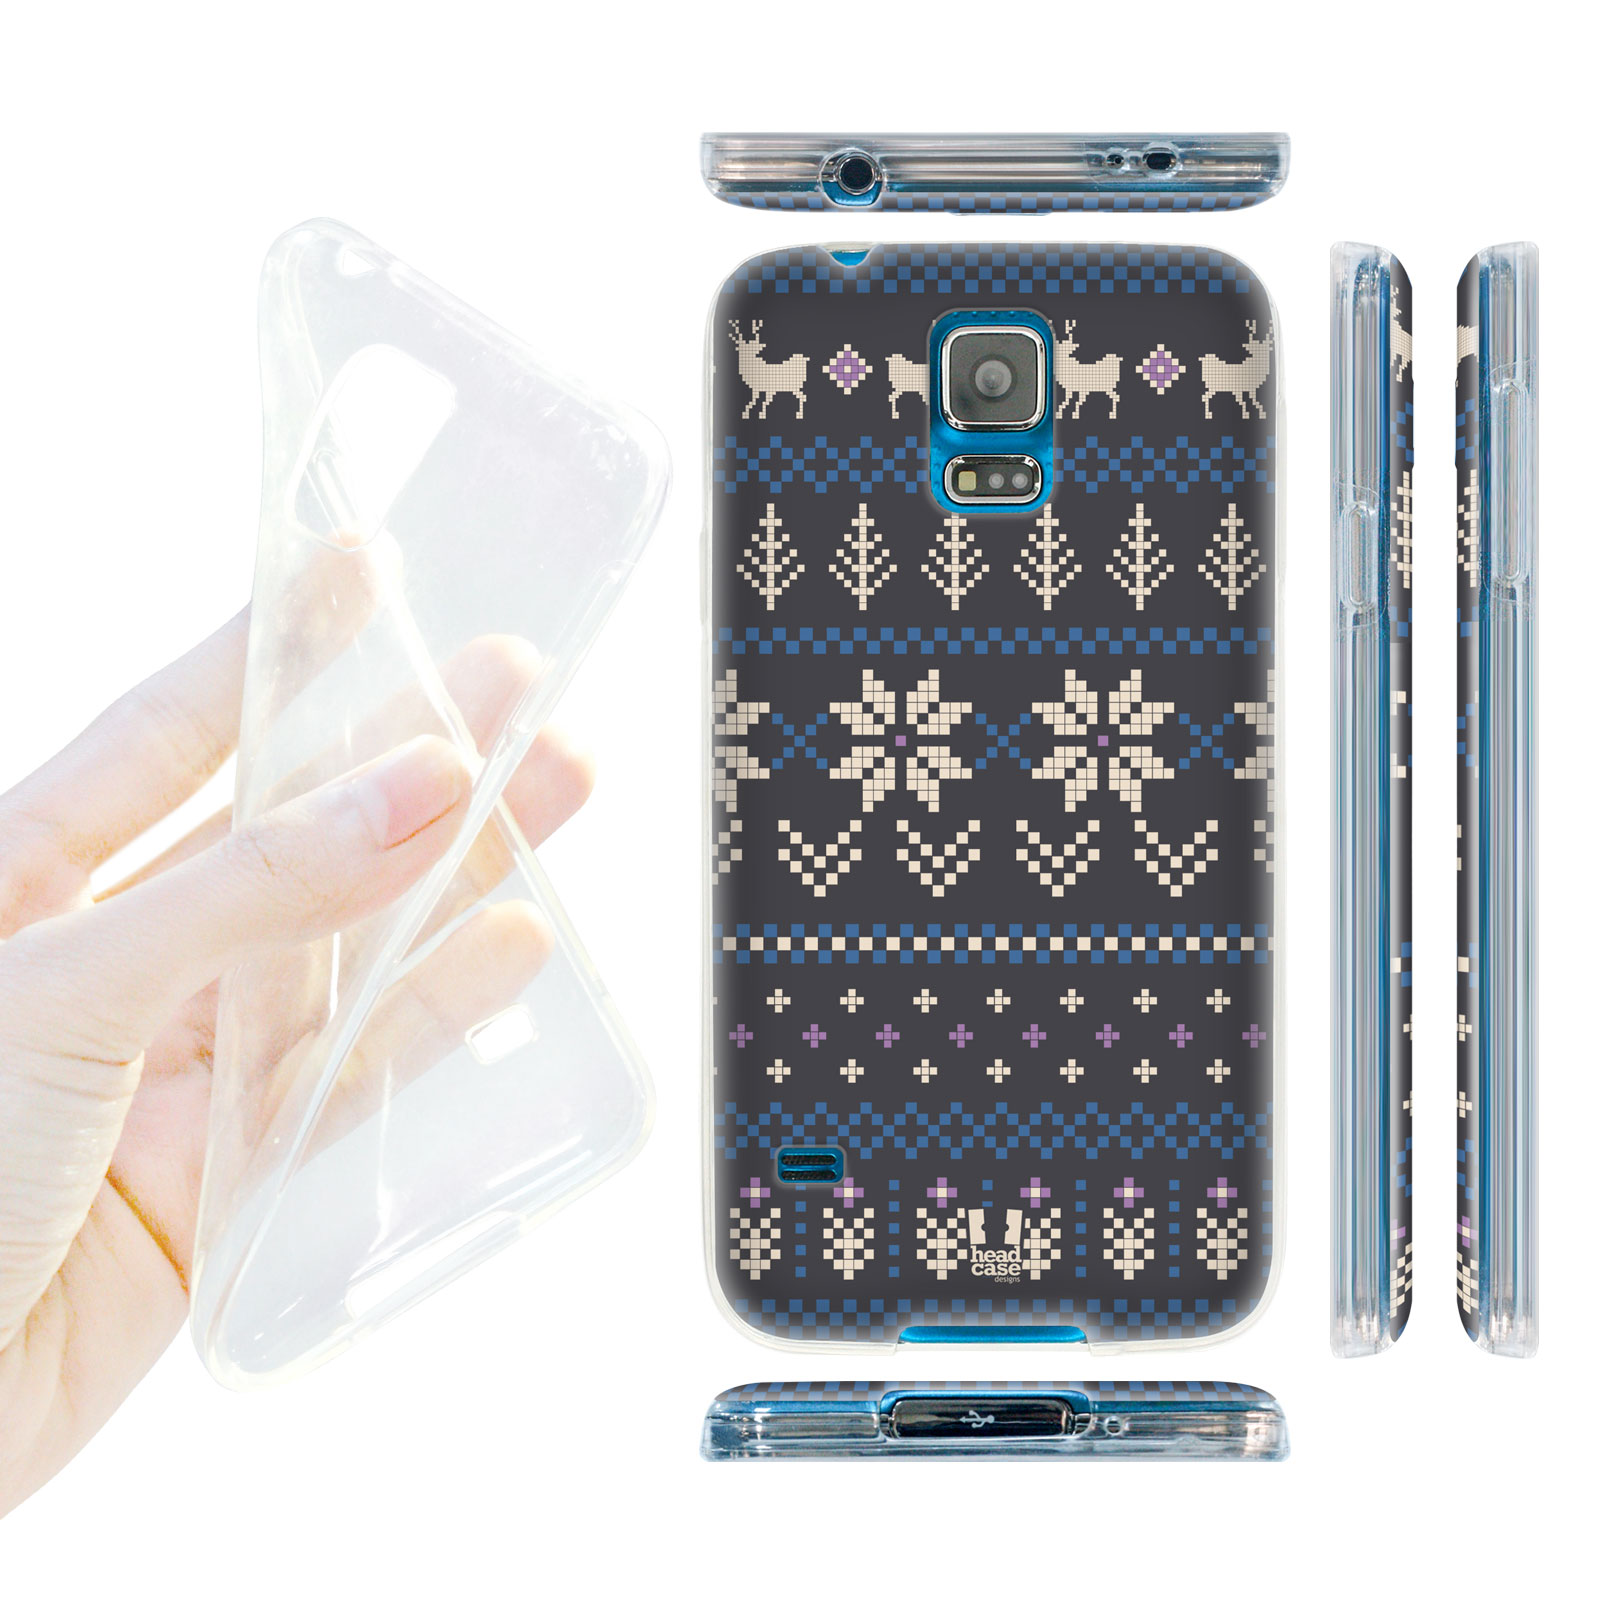 HEAD CASE silikonový obal na mobil Samsung galaxy S5 zimní motiv modrá a šedá